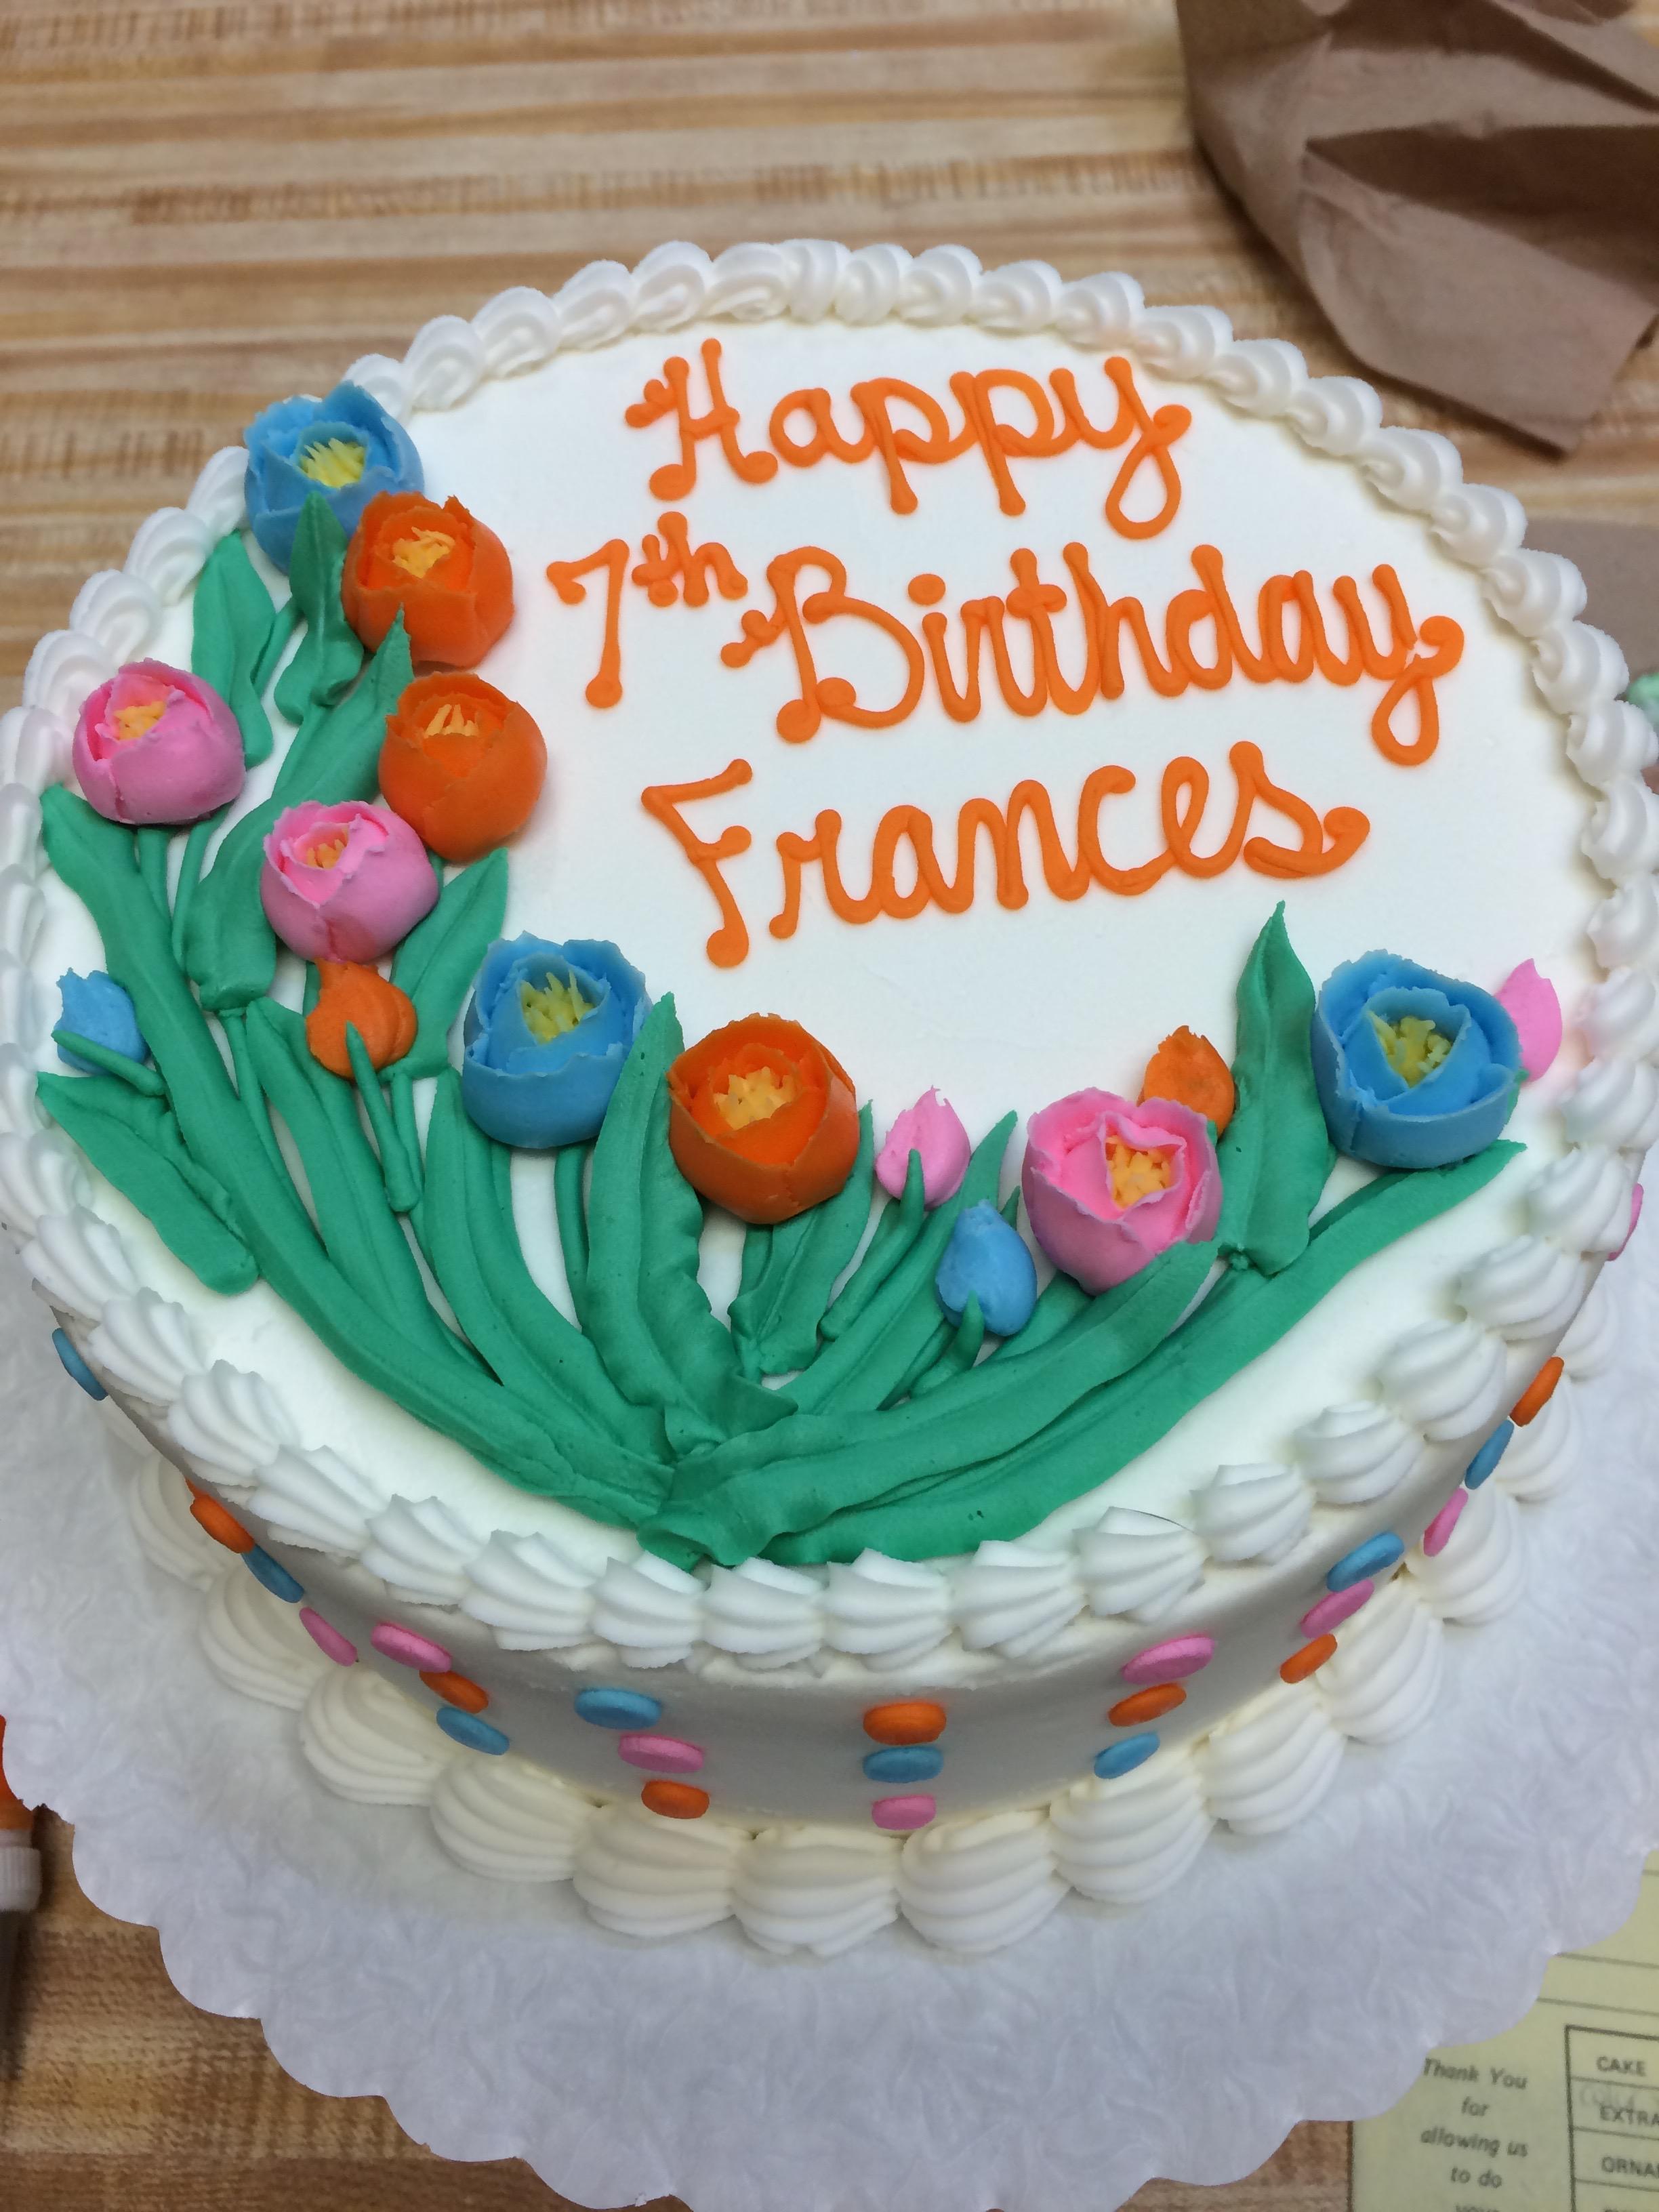 Tremendous Birthday Cakes W Flowers Westhampton Pastry Shop Richmond Va Personalised Birthday Cards Beptaeletsinfo